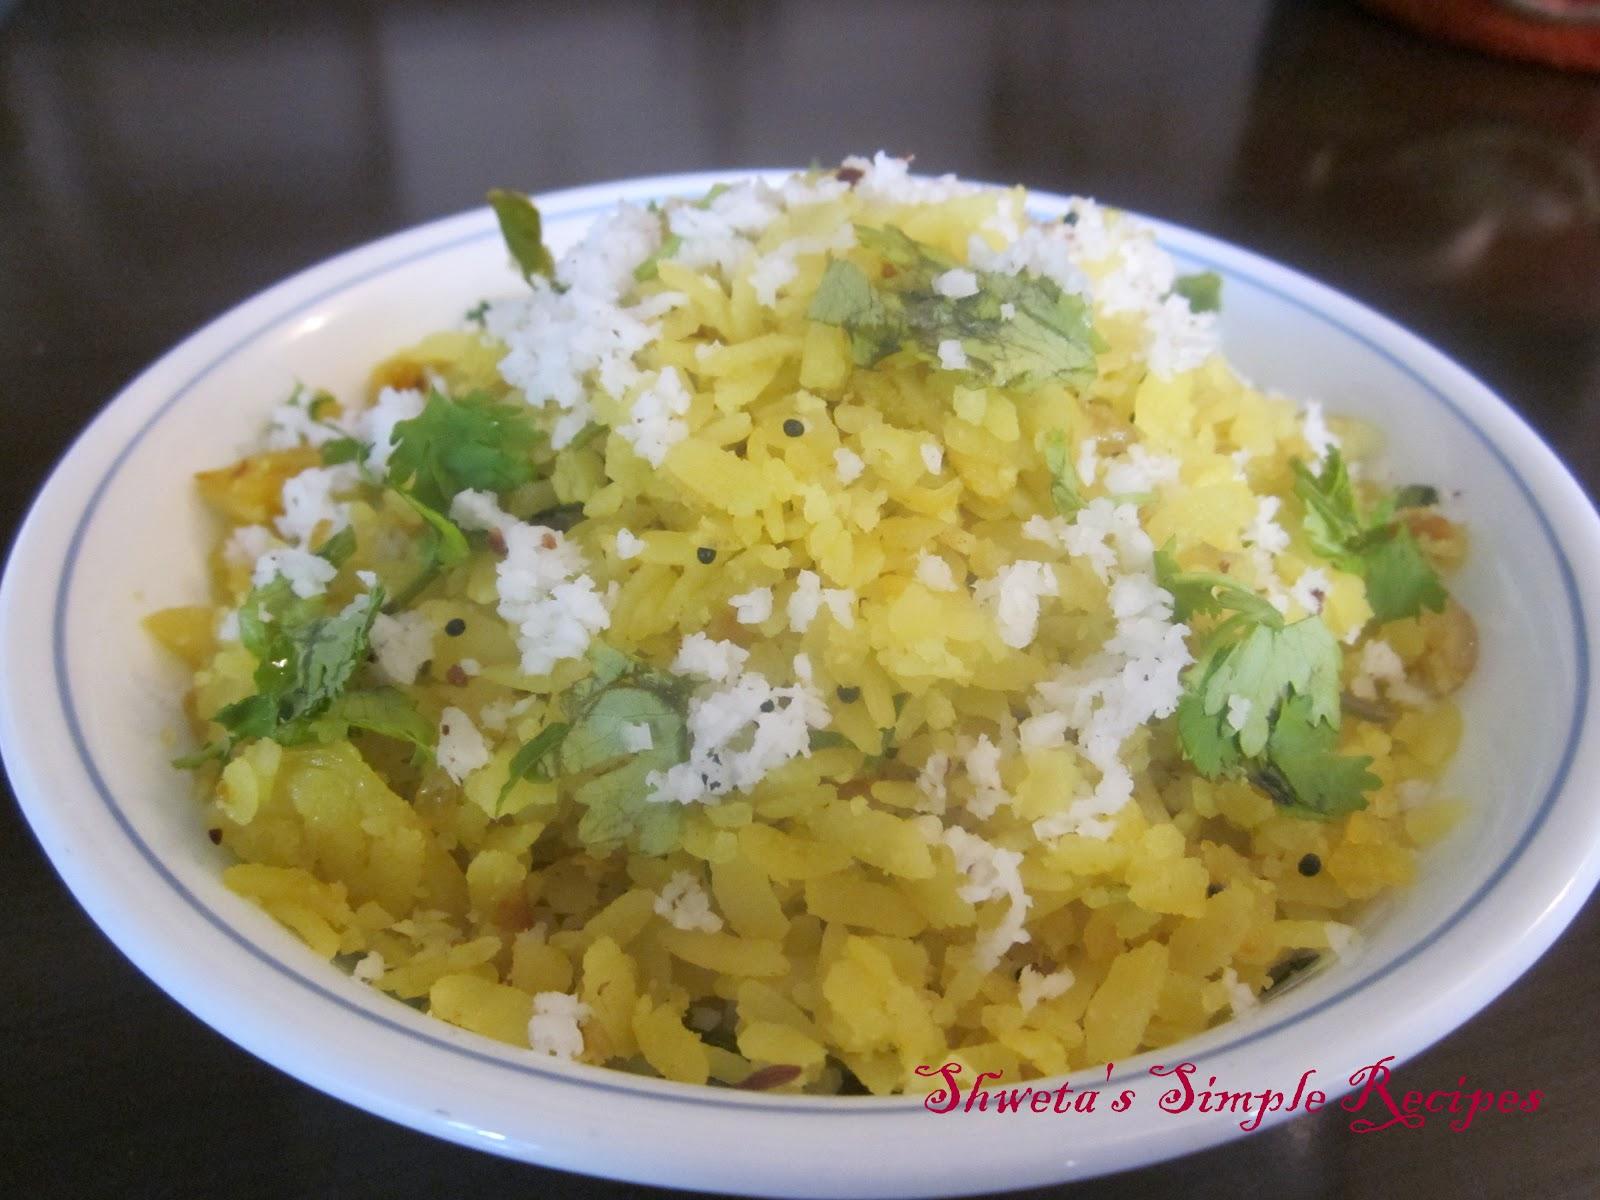 Various Cake Recipes In Marathi: Shweta's Simple Recipes: Batata Poha